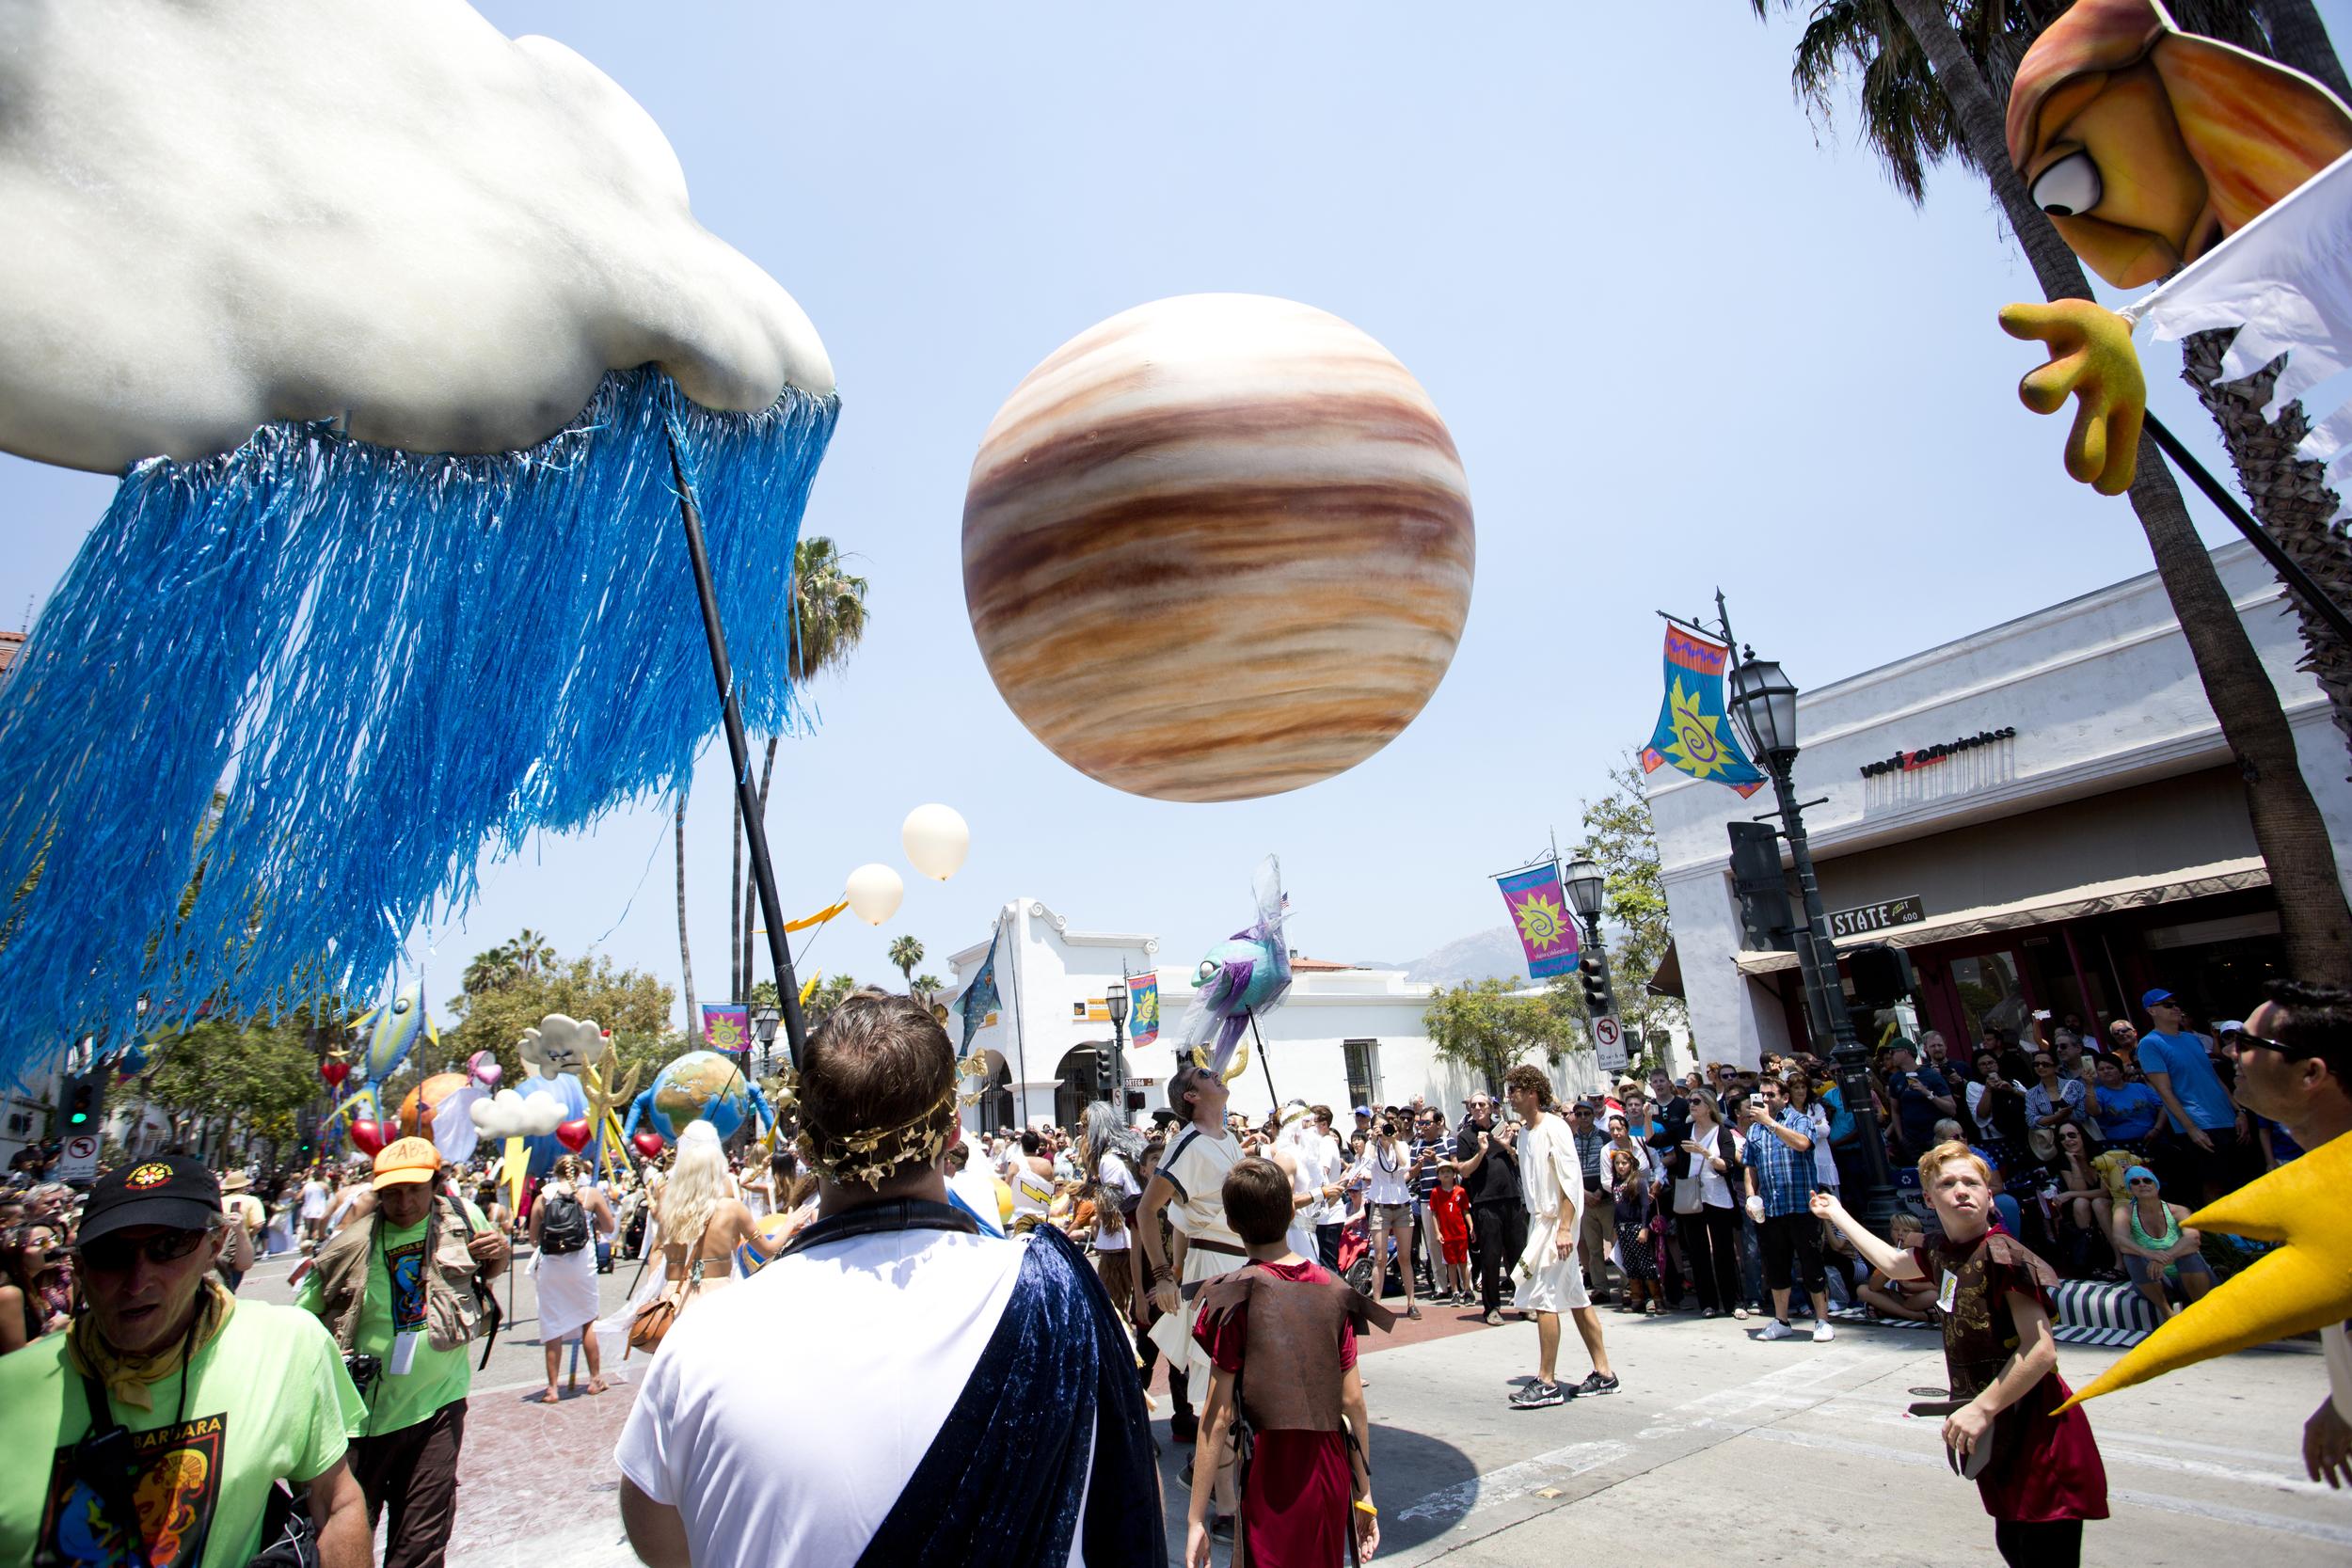 Giant Jupiter Bouncing Ball by Matthew McAvene for Santa Barbara Solstice Parade